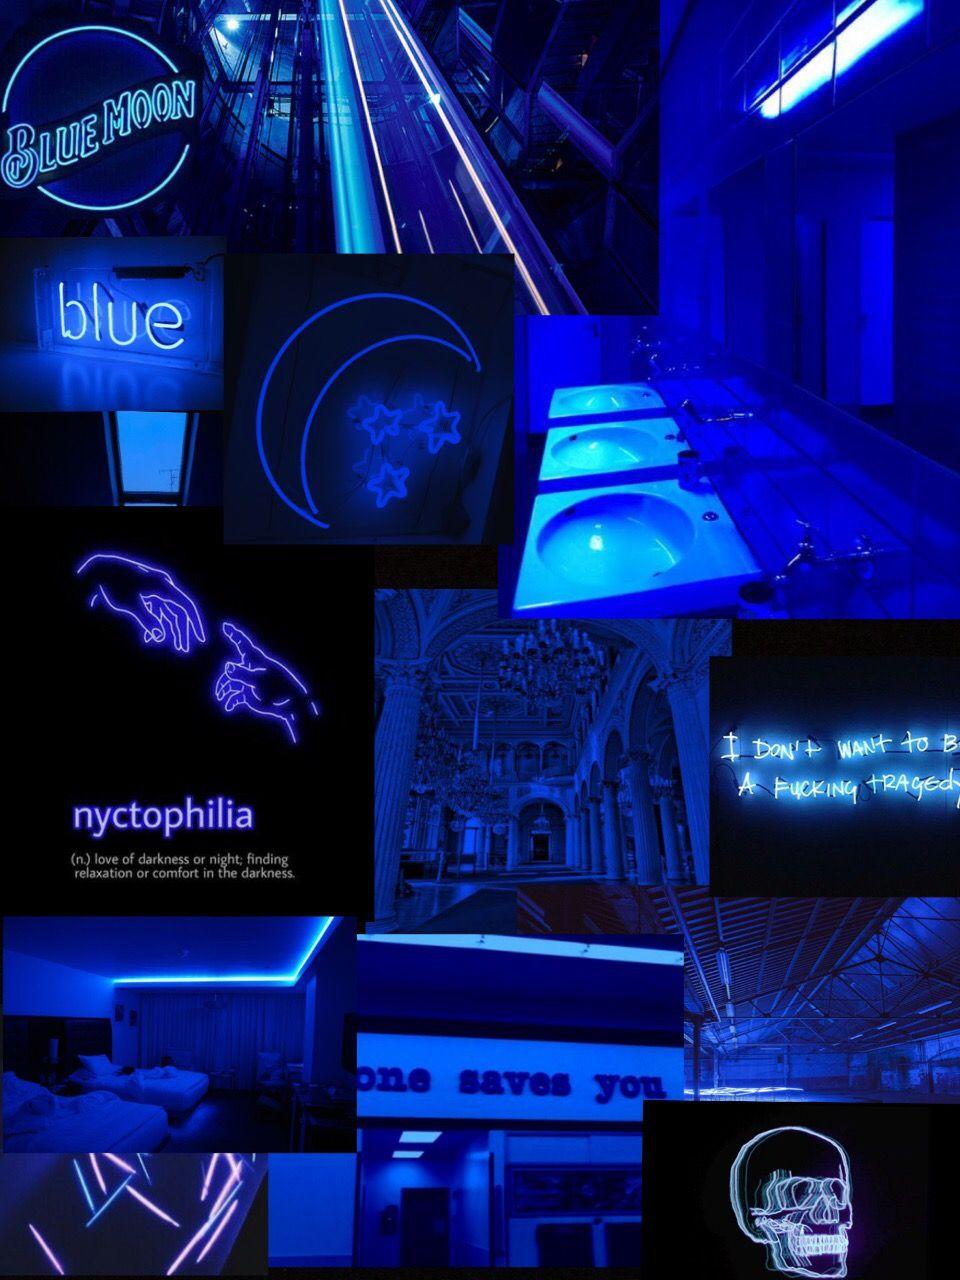 Dark Blue Neon Aesthetic Wallpaper Lock Screen In 2020 Pink Neon Wallpaper Neon Wallpaper Wallpaper Iphone Neon